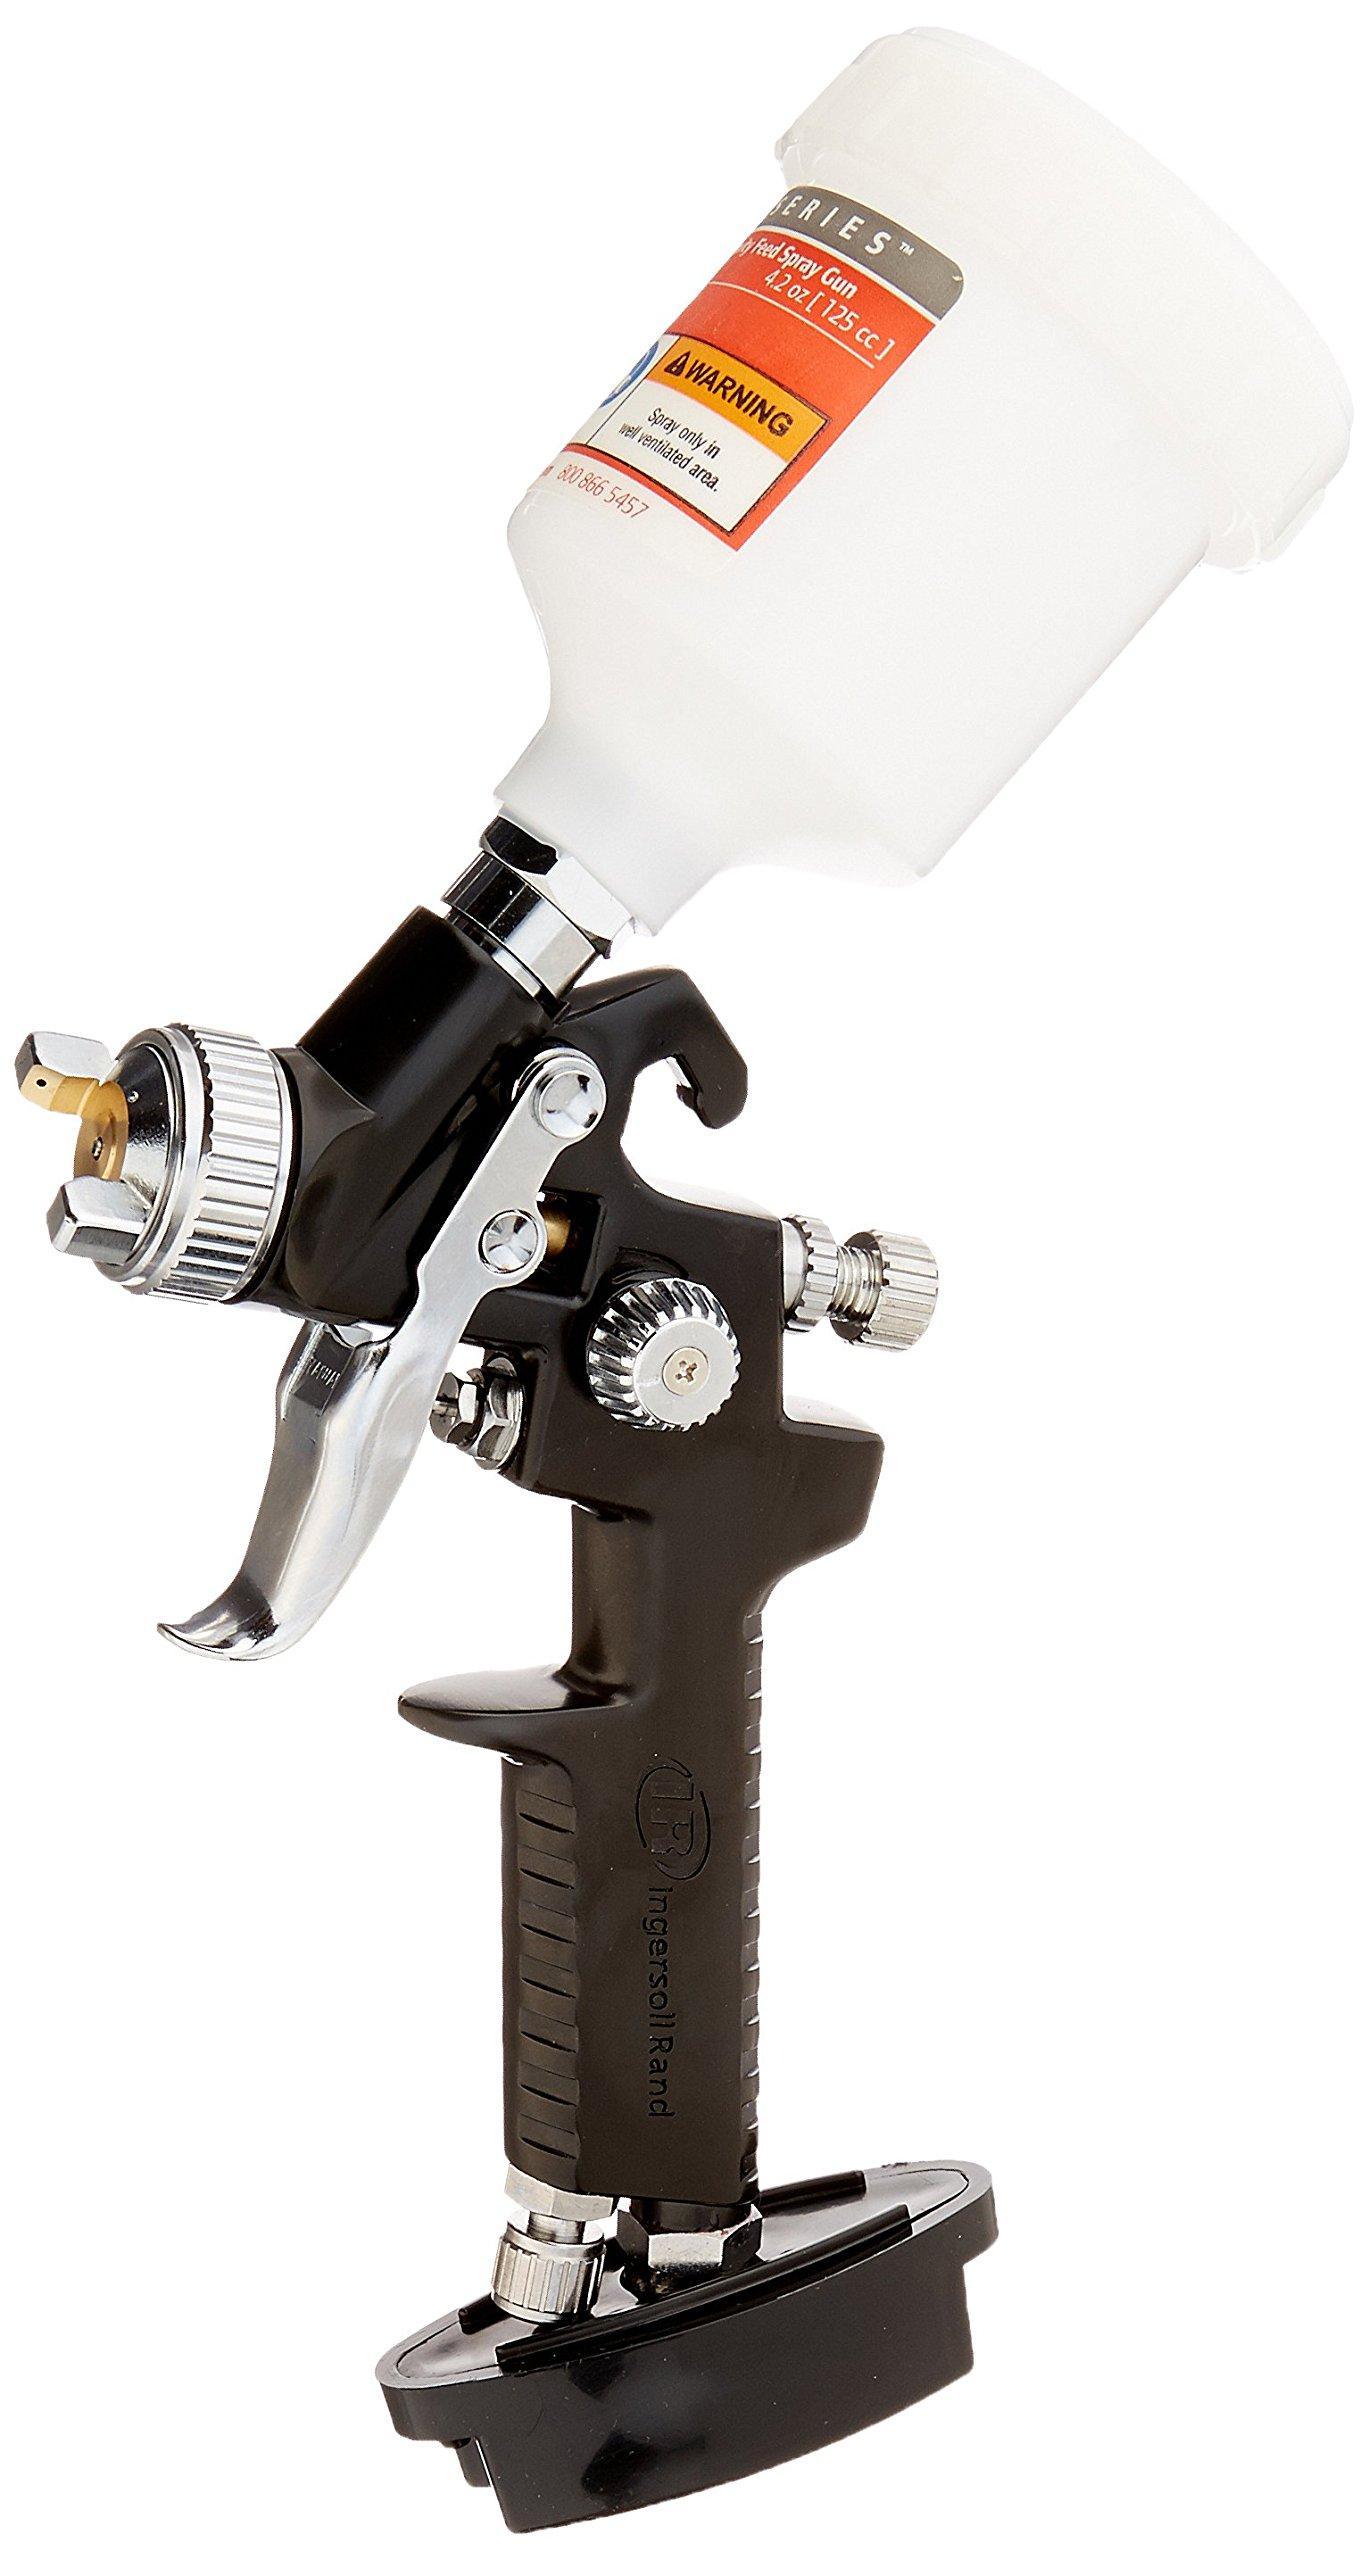 Pistola Para Pintar Ingersoll Rand 200G Edge Series de re...